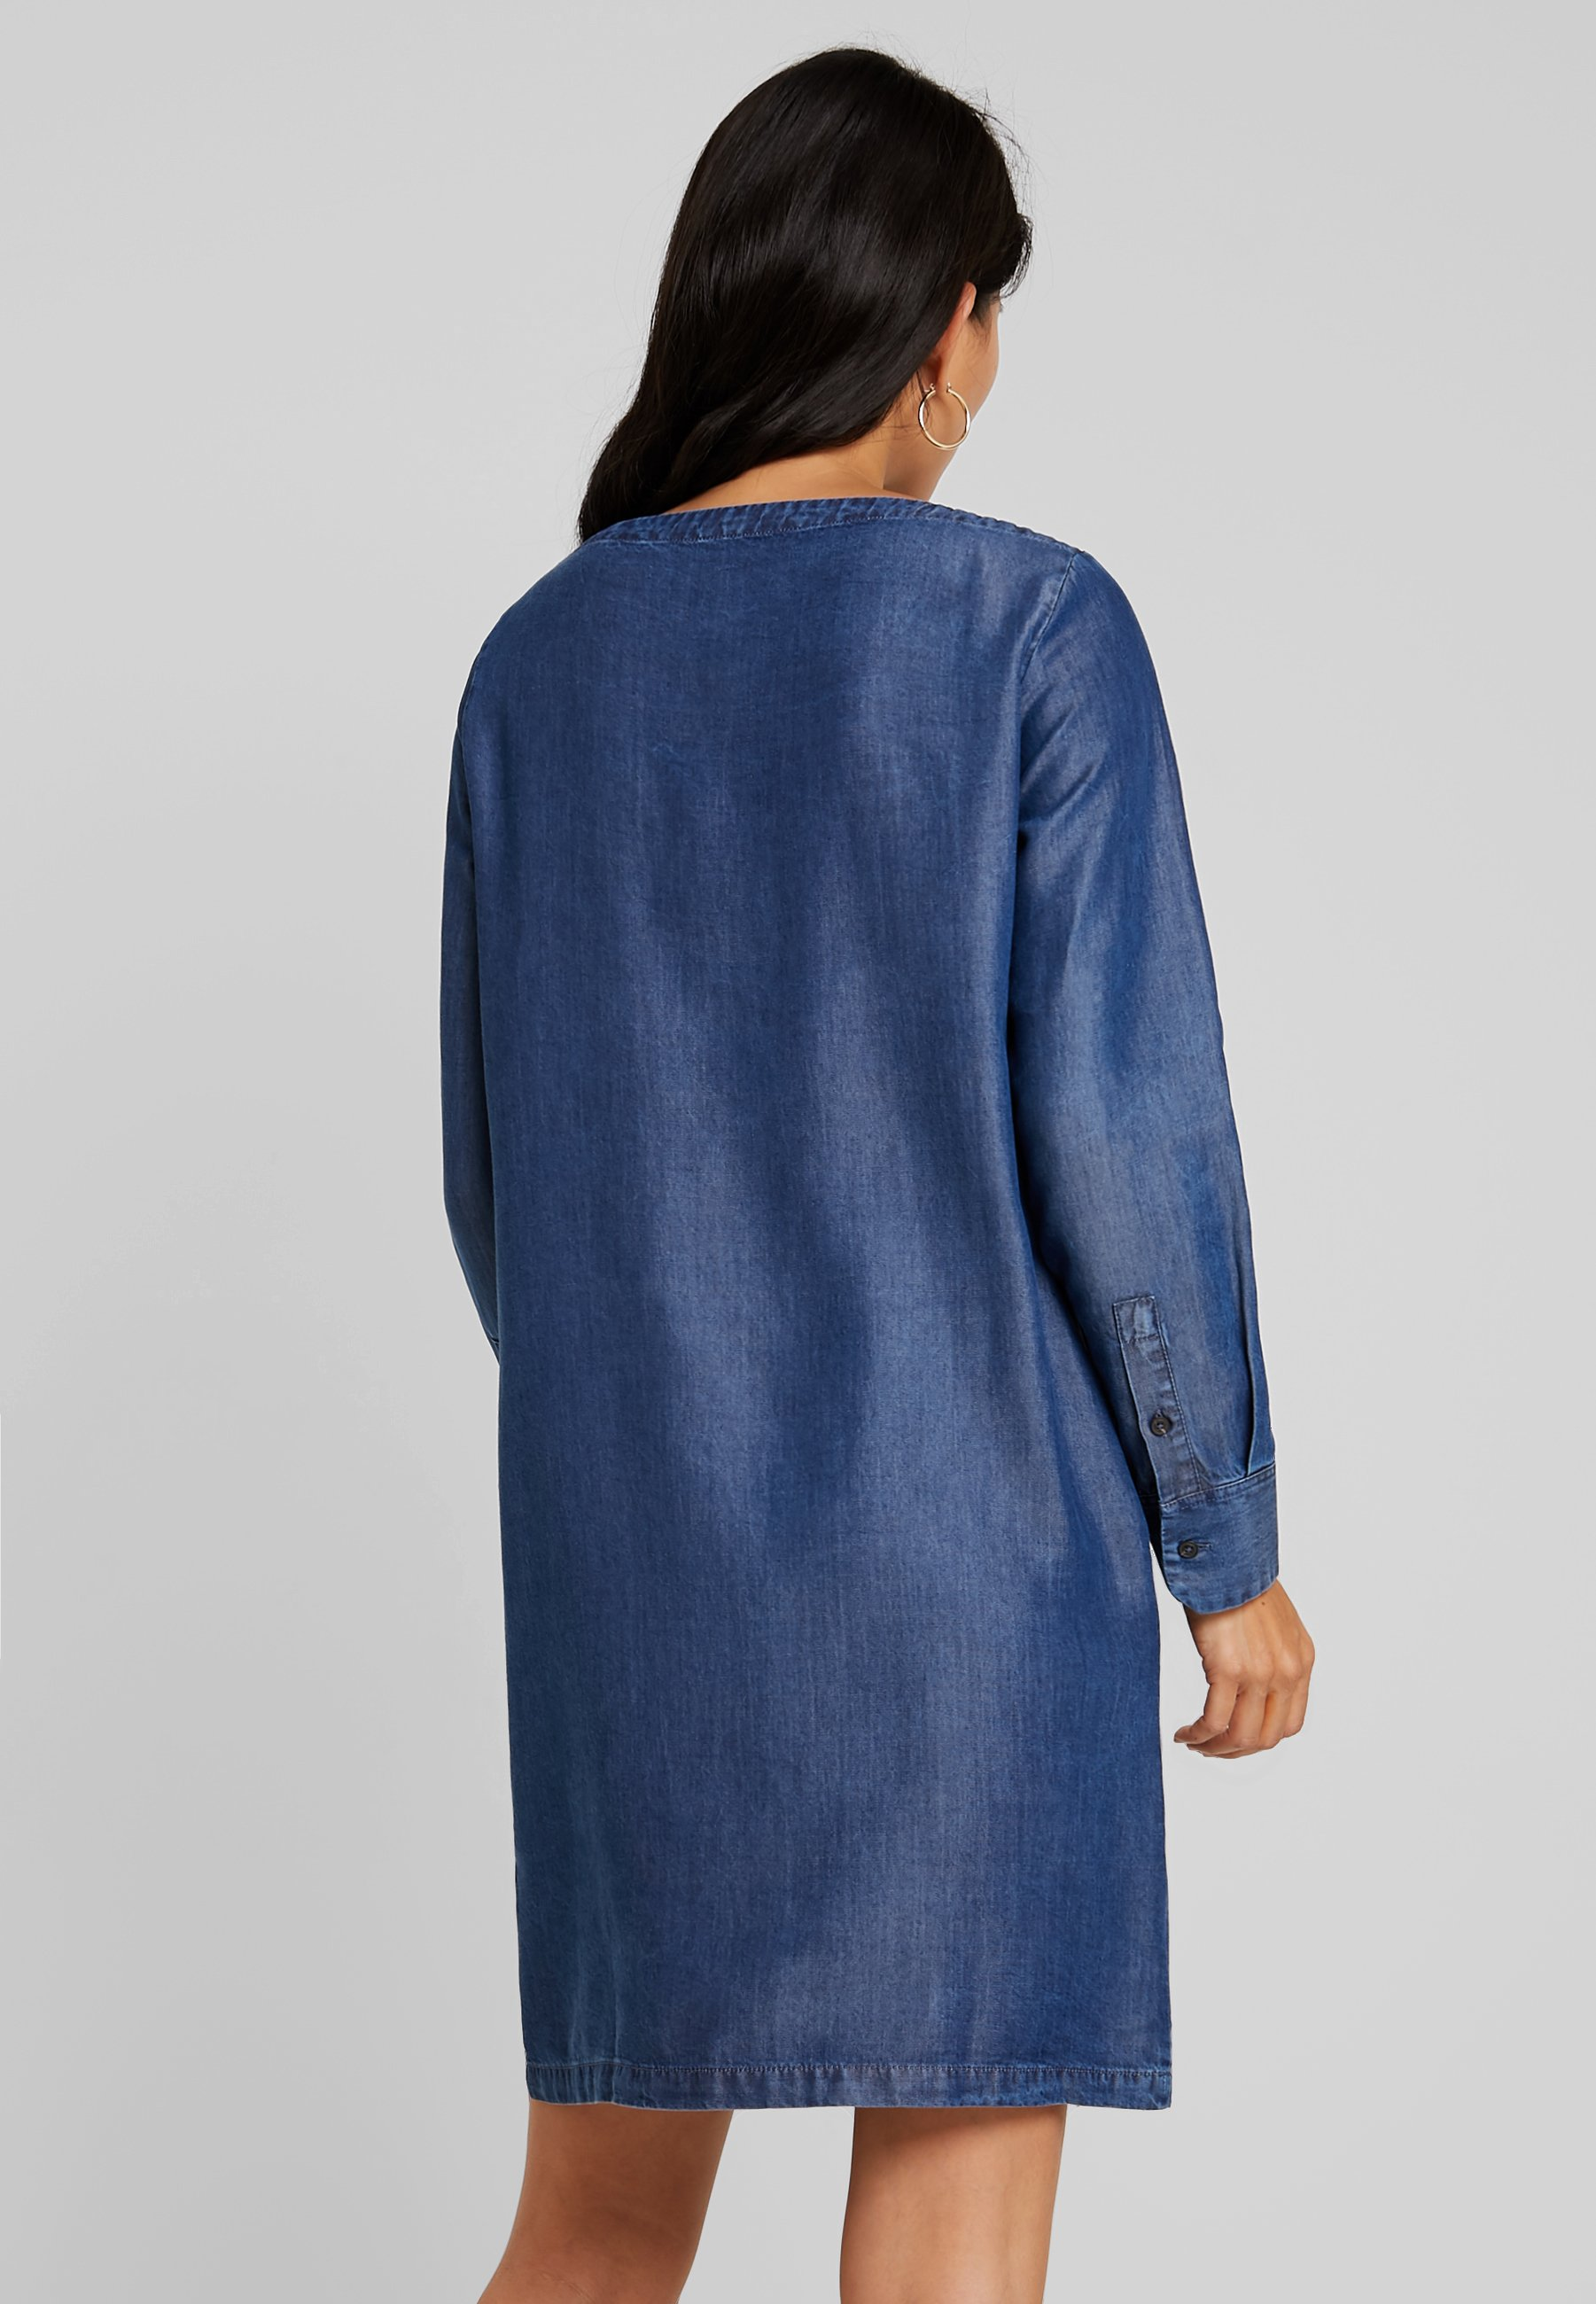 Style Jean O'polo Dress Blue Marc Tunique PocketRobe En Breast Indigo nwPkO0X8